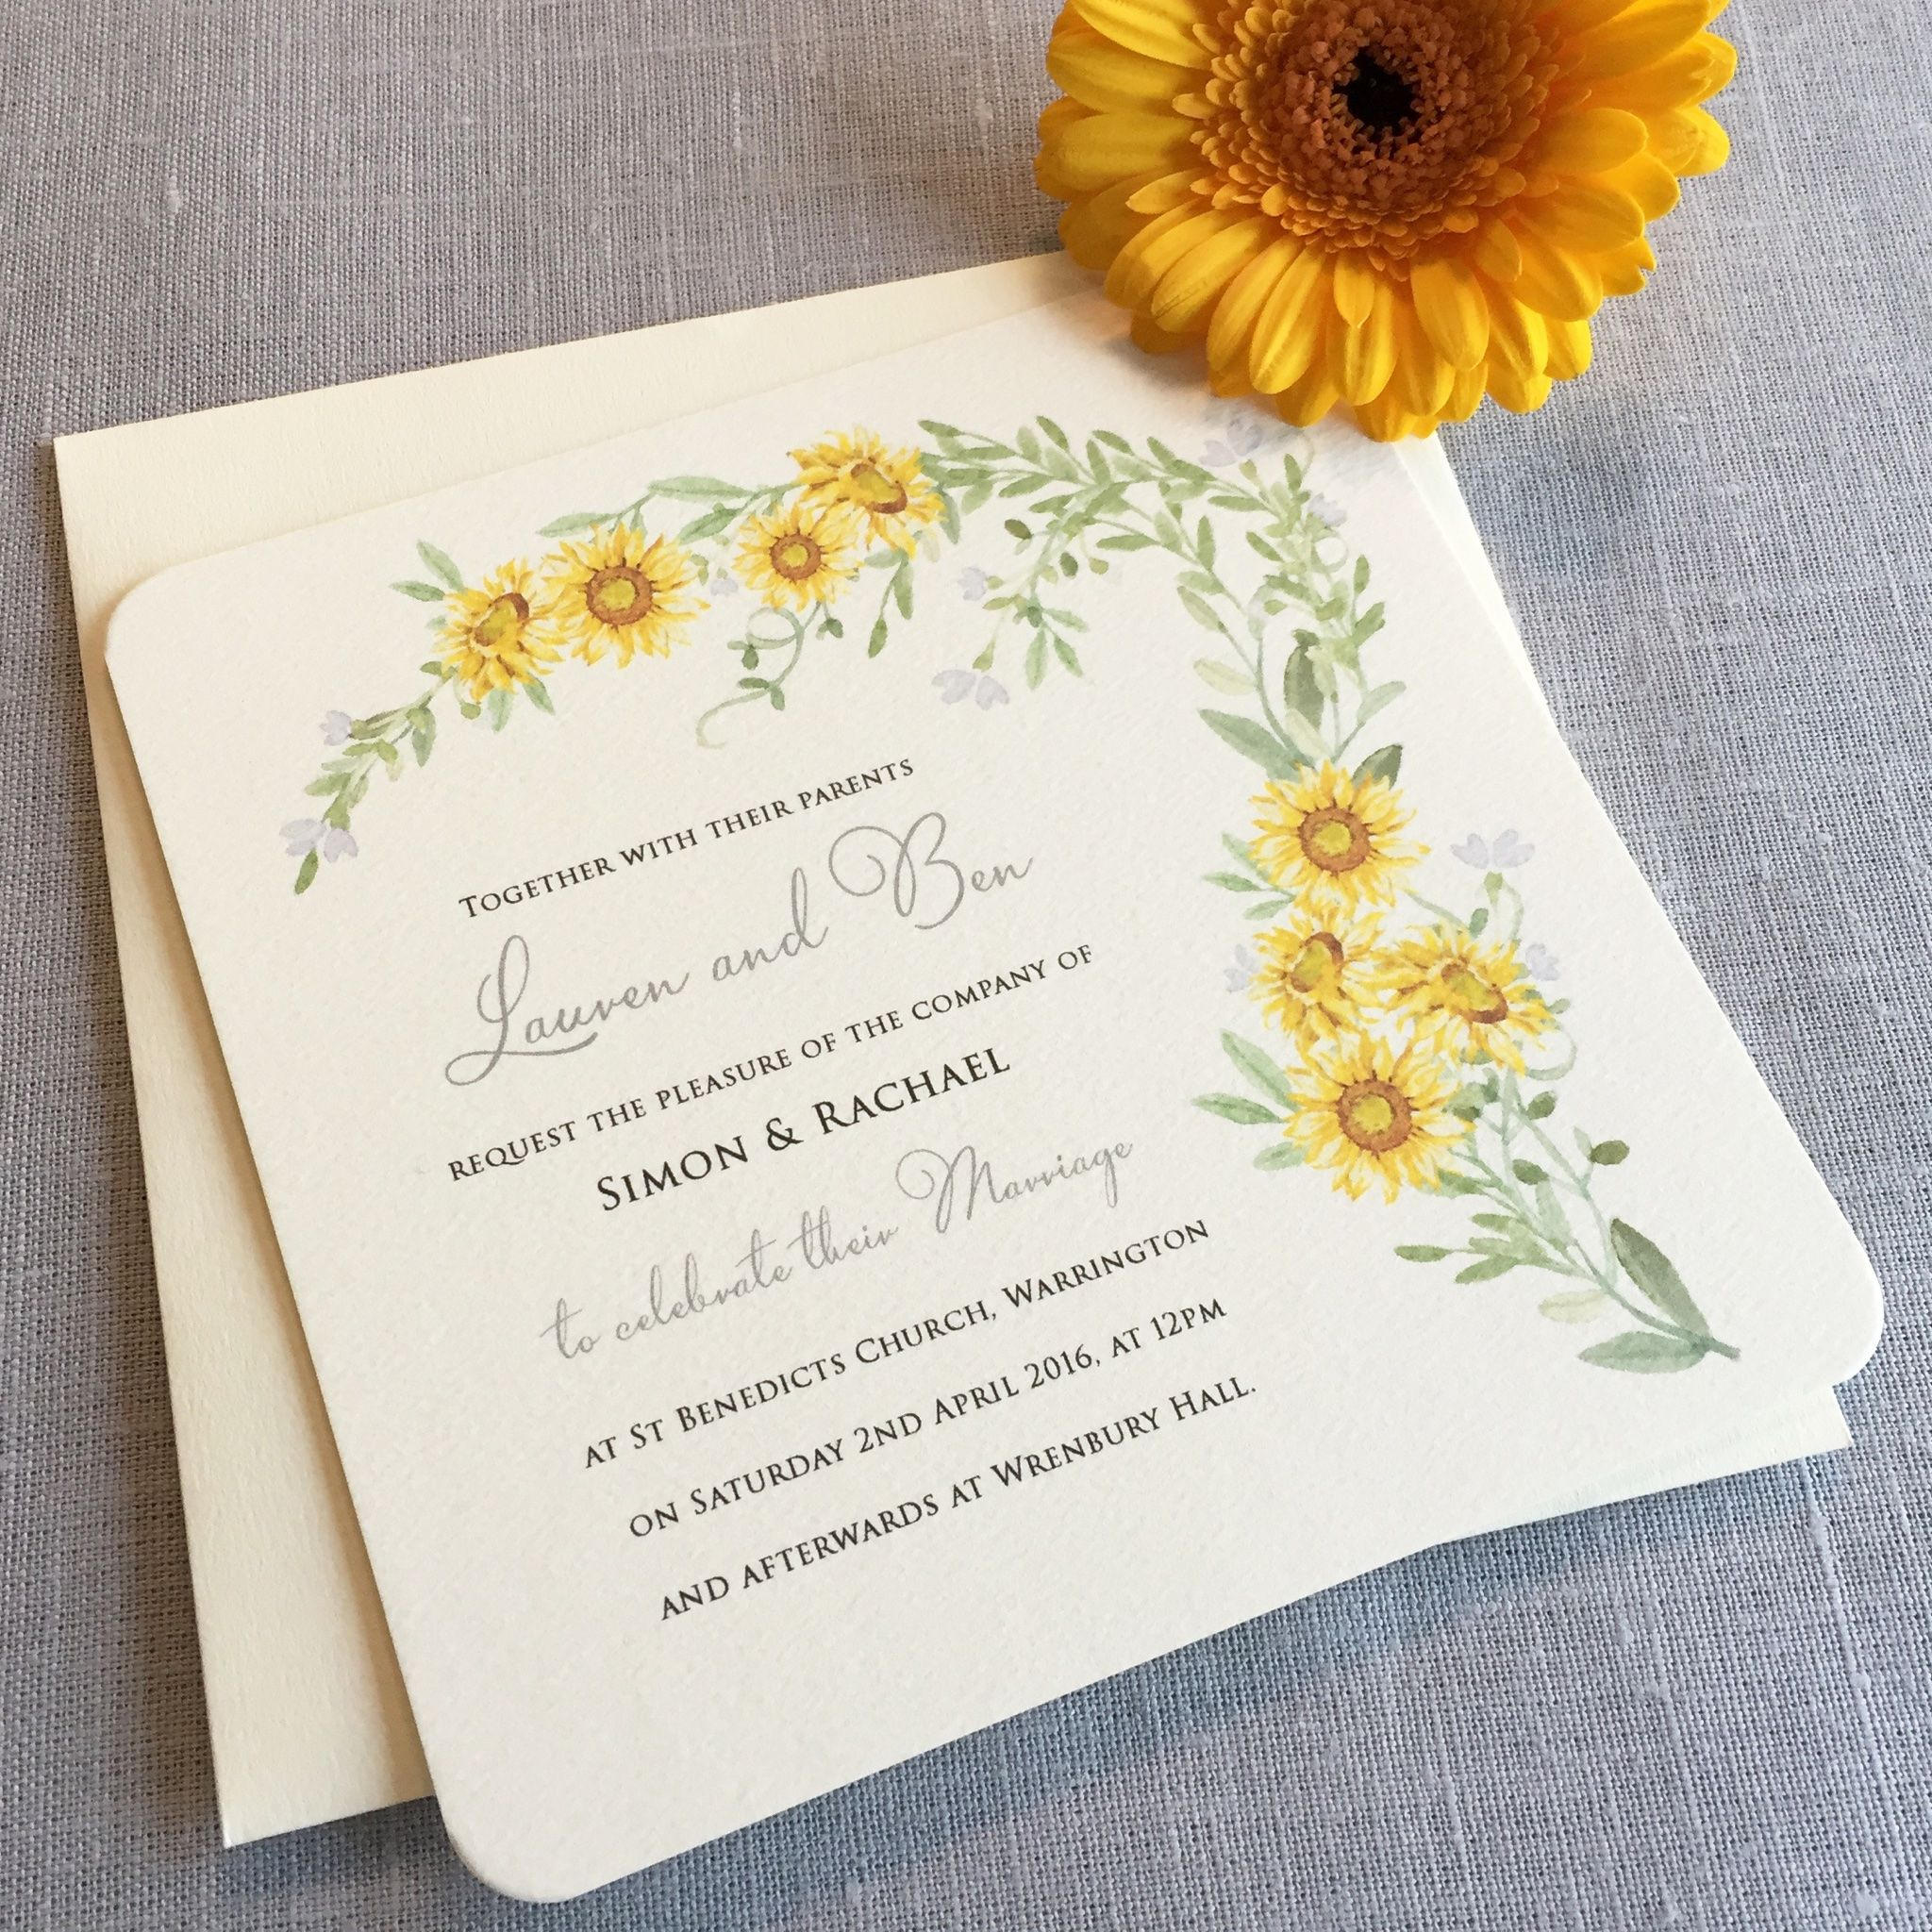 Sunflower wedding invite Sunflower wedding invitations